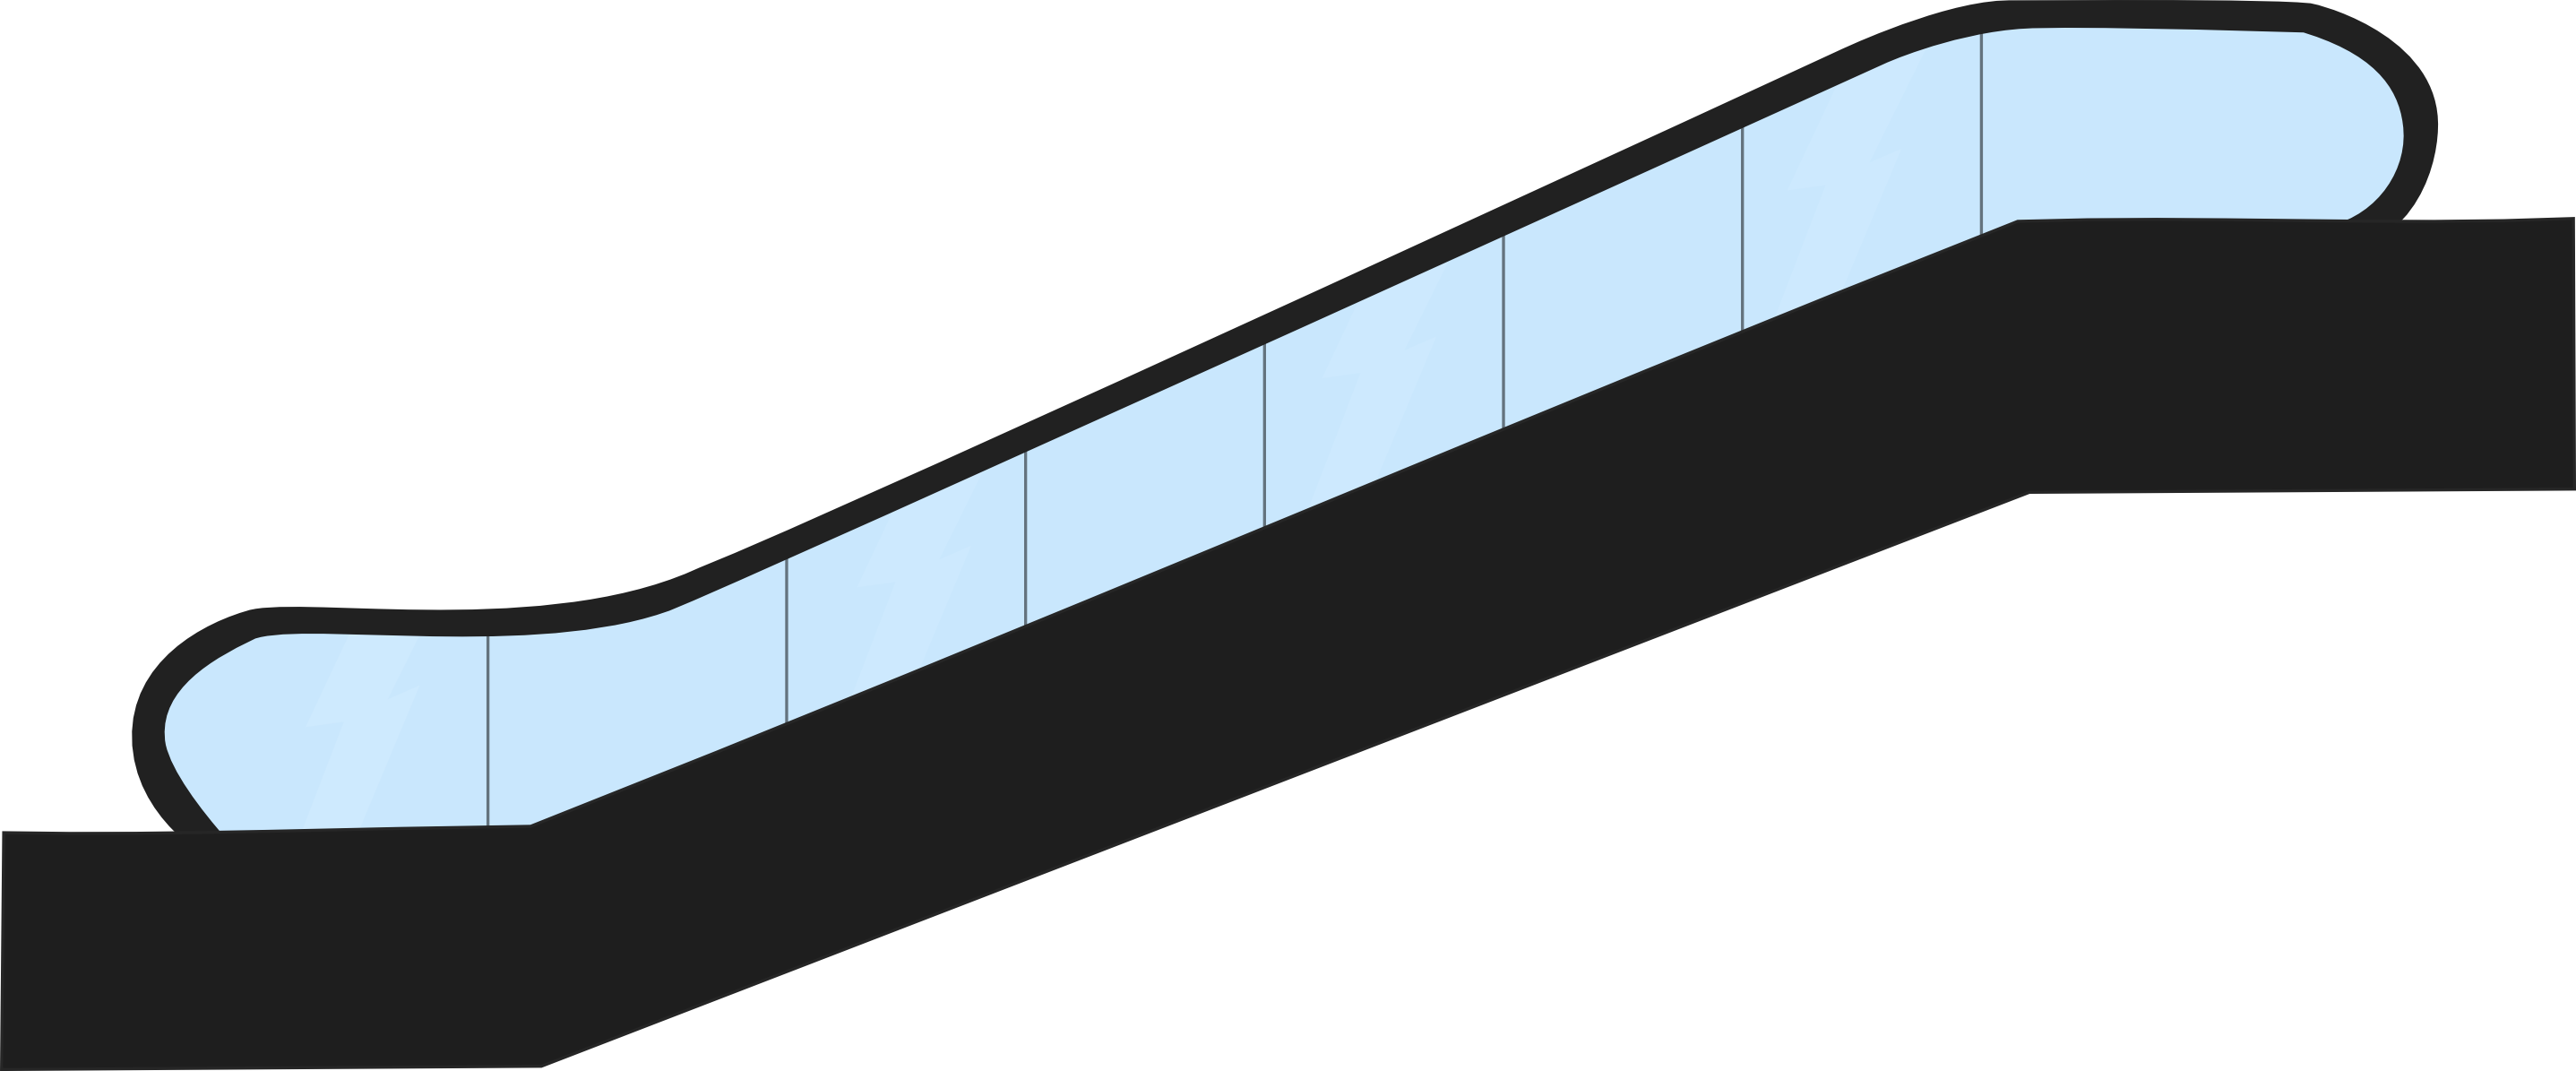 Escalator PNG Transparent Image